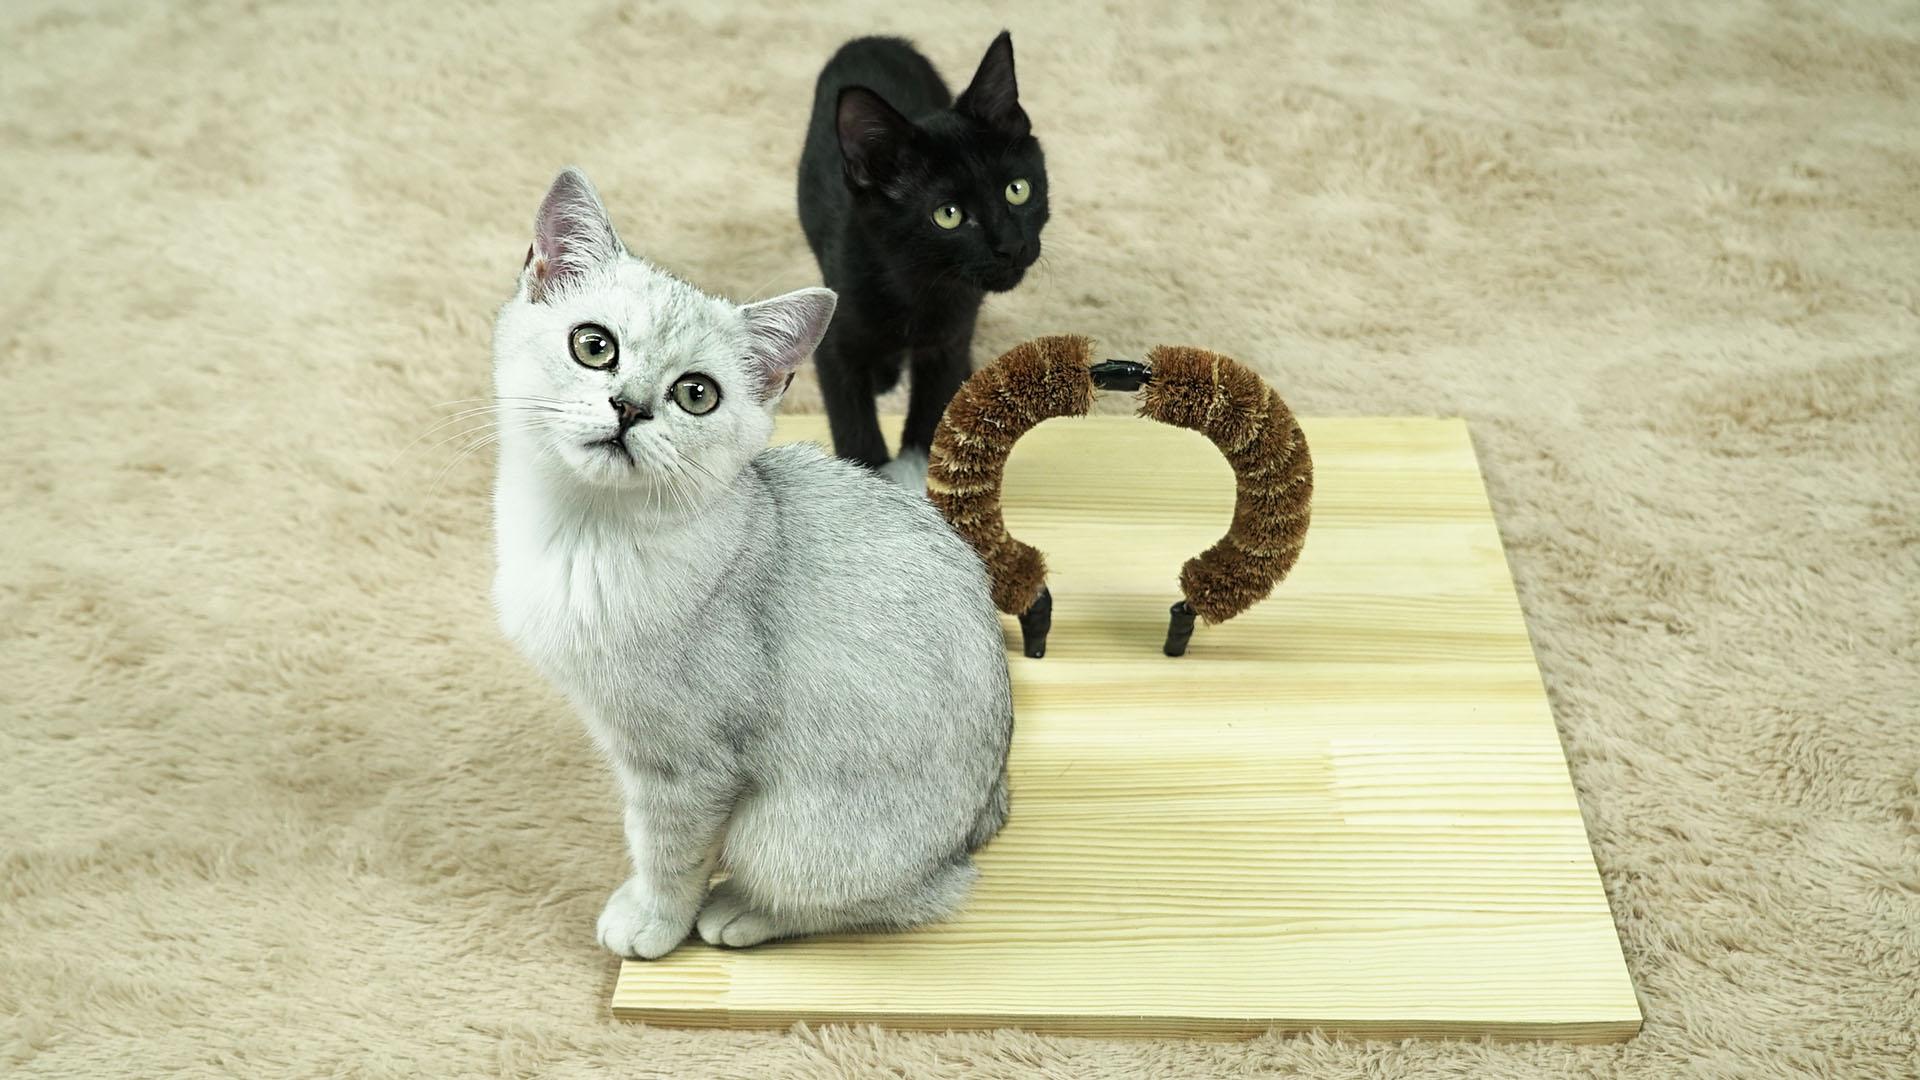 DIY猫咪梳毛器【举起爪儿来】